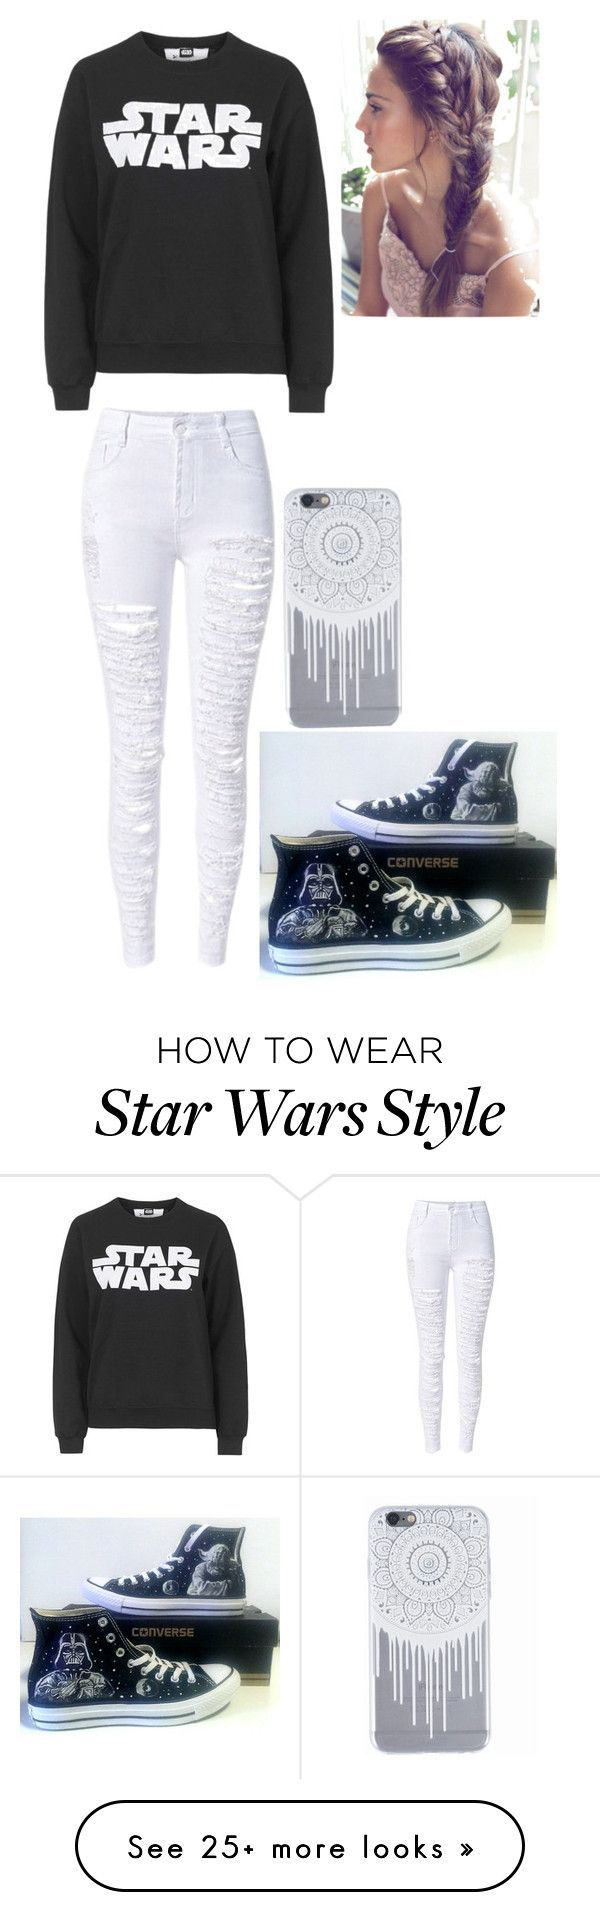 Star Wars Sets